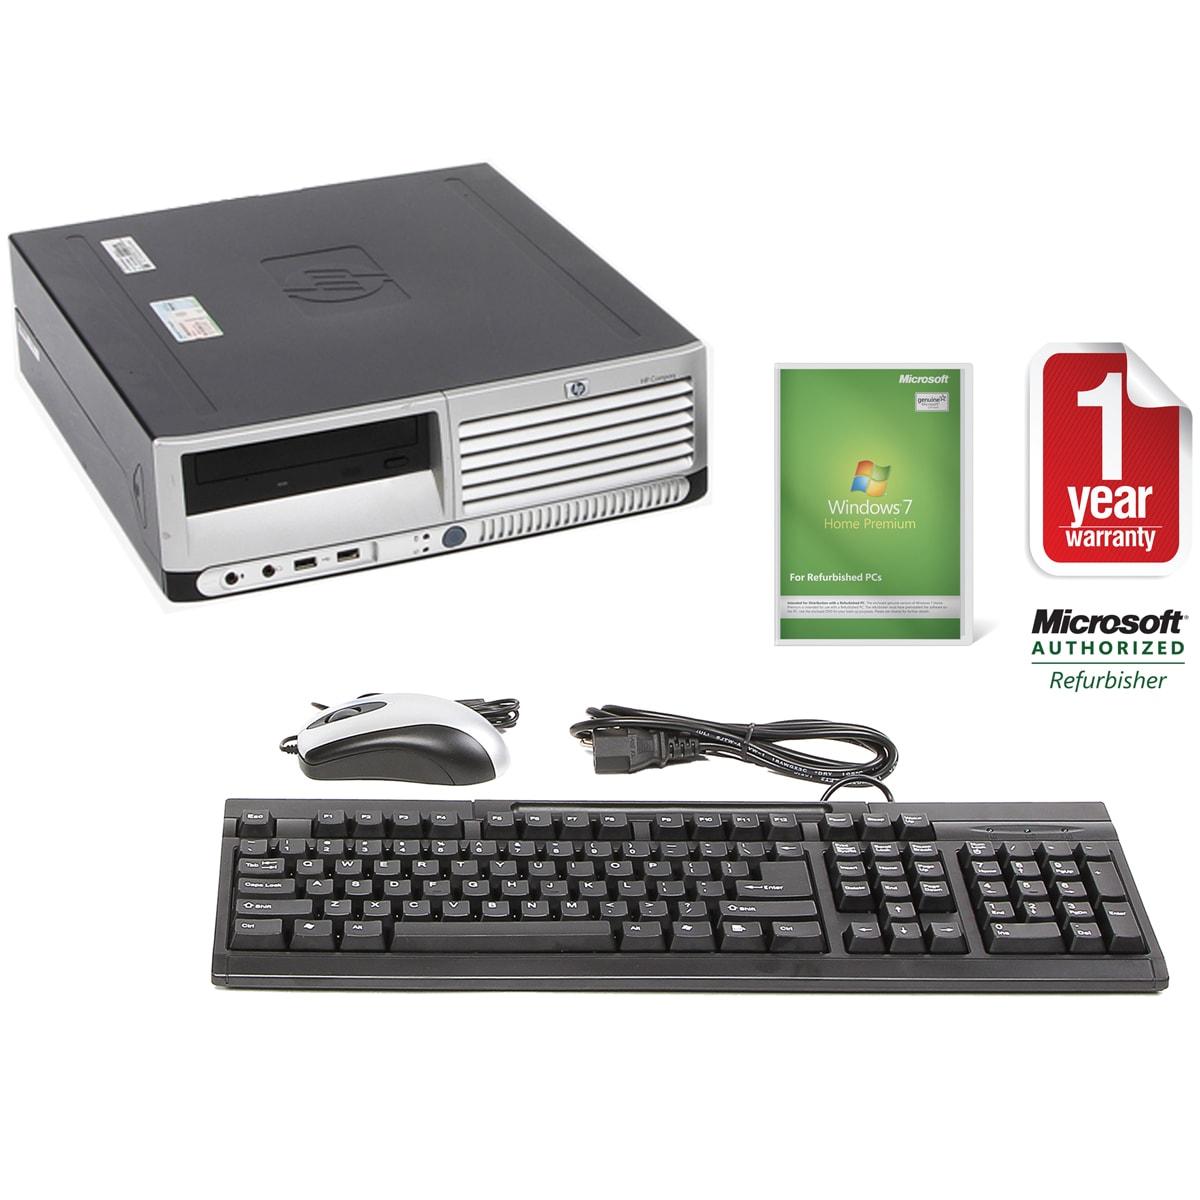 HP DC7700 3.0GHz 1TB SFF Computer (Refurbished)